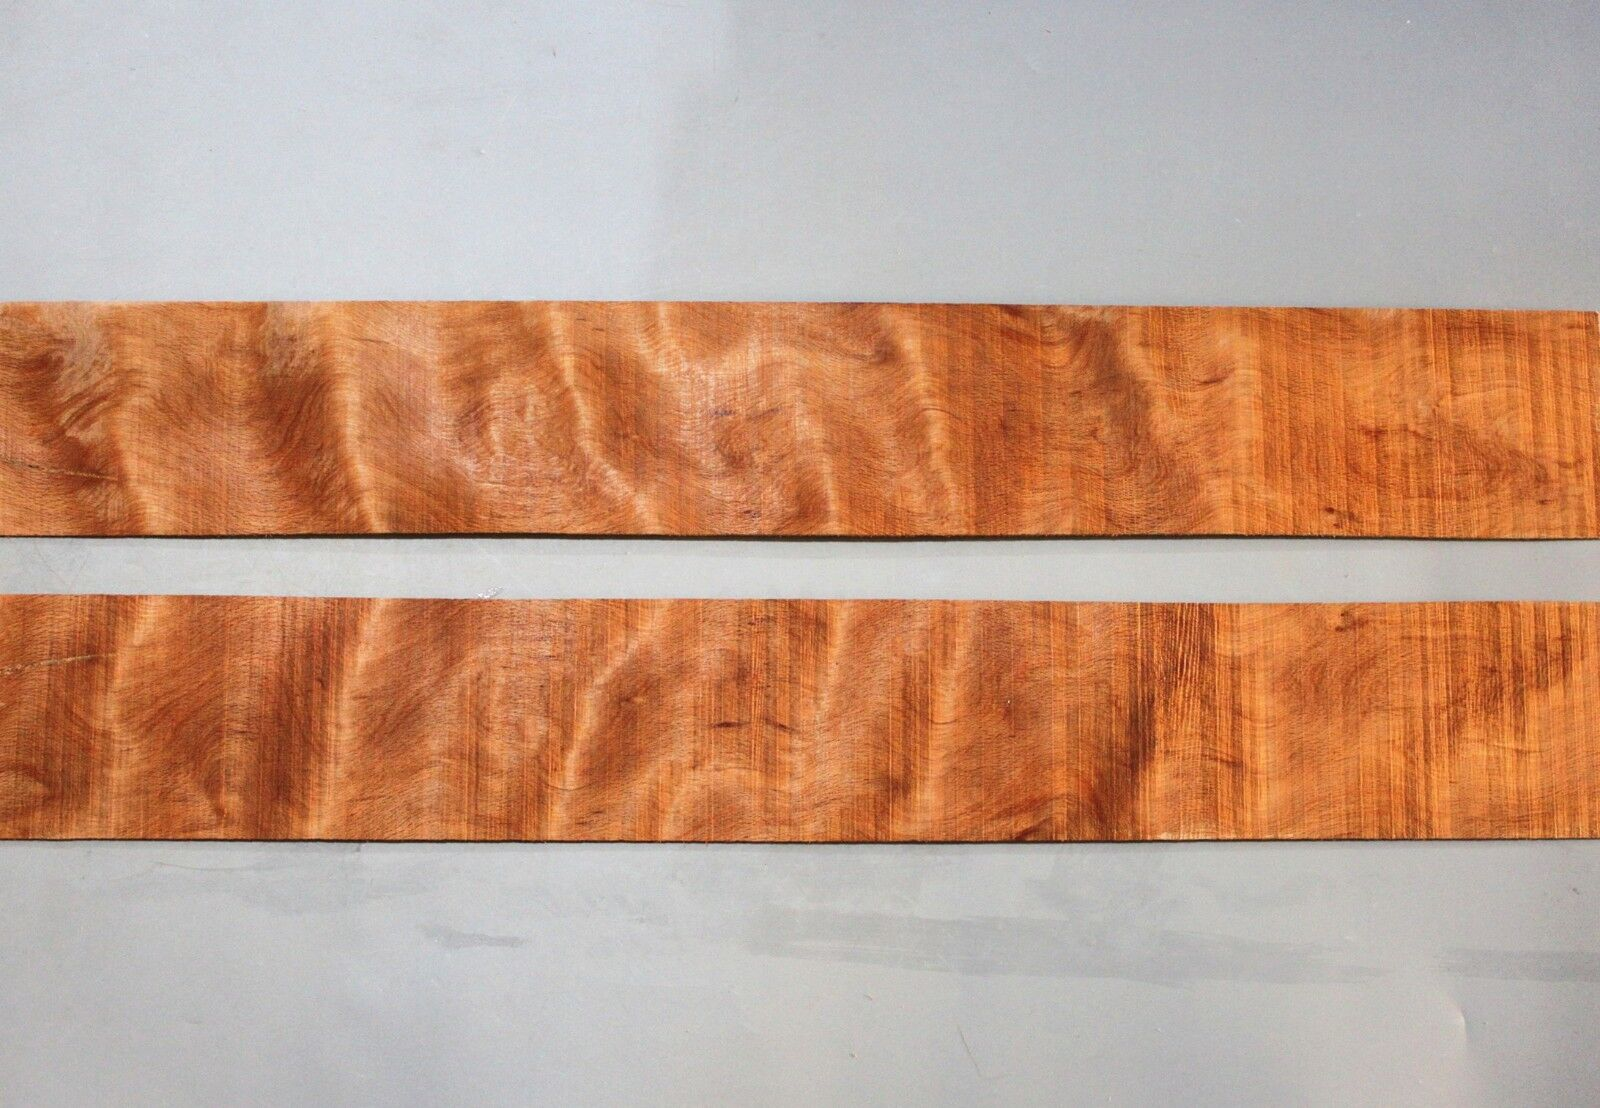 JB359 Ripple Maple Tonewood Guitar Sides Set Acoustic Supply 30 x4.35 x0.15